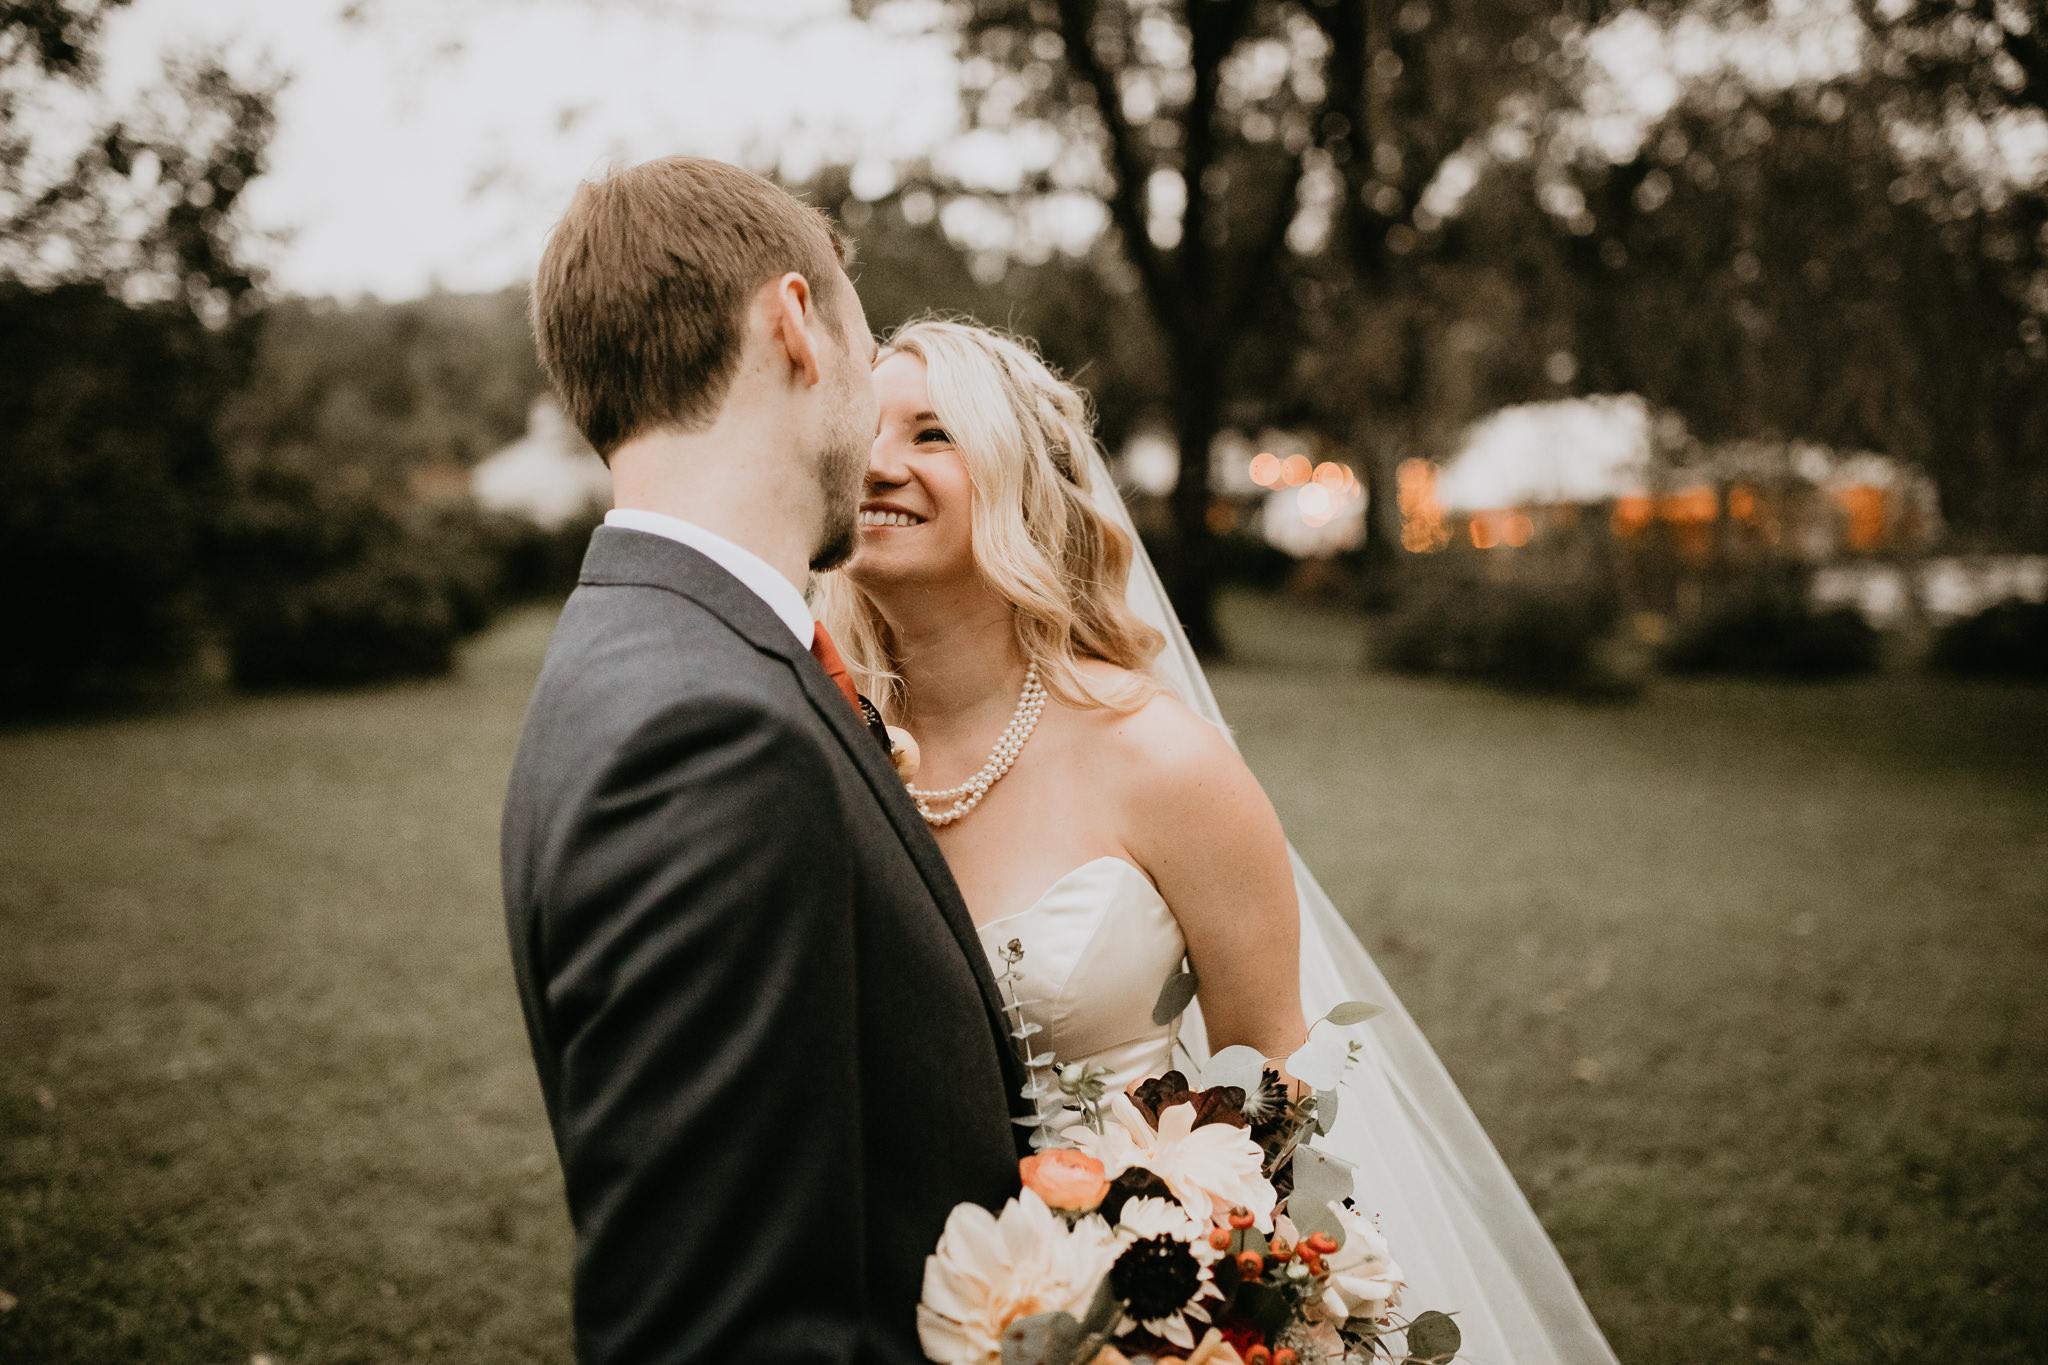 Sundara - Weddings - Virginia - Best Wedding Photographer - Pat Cori Photography-76.jpg